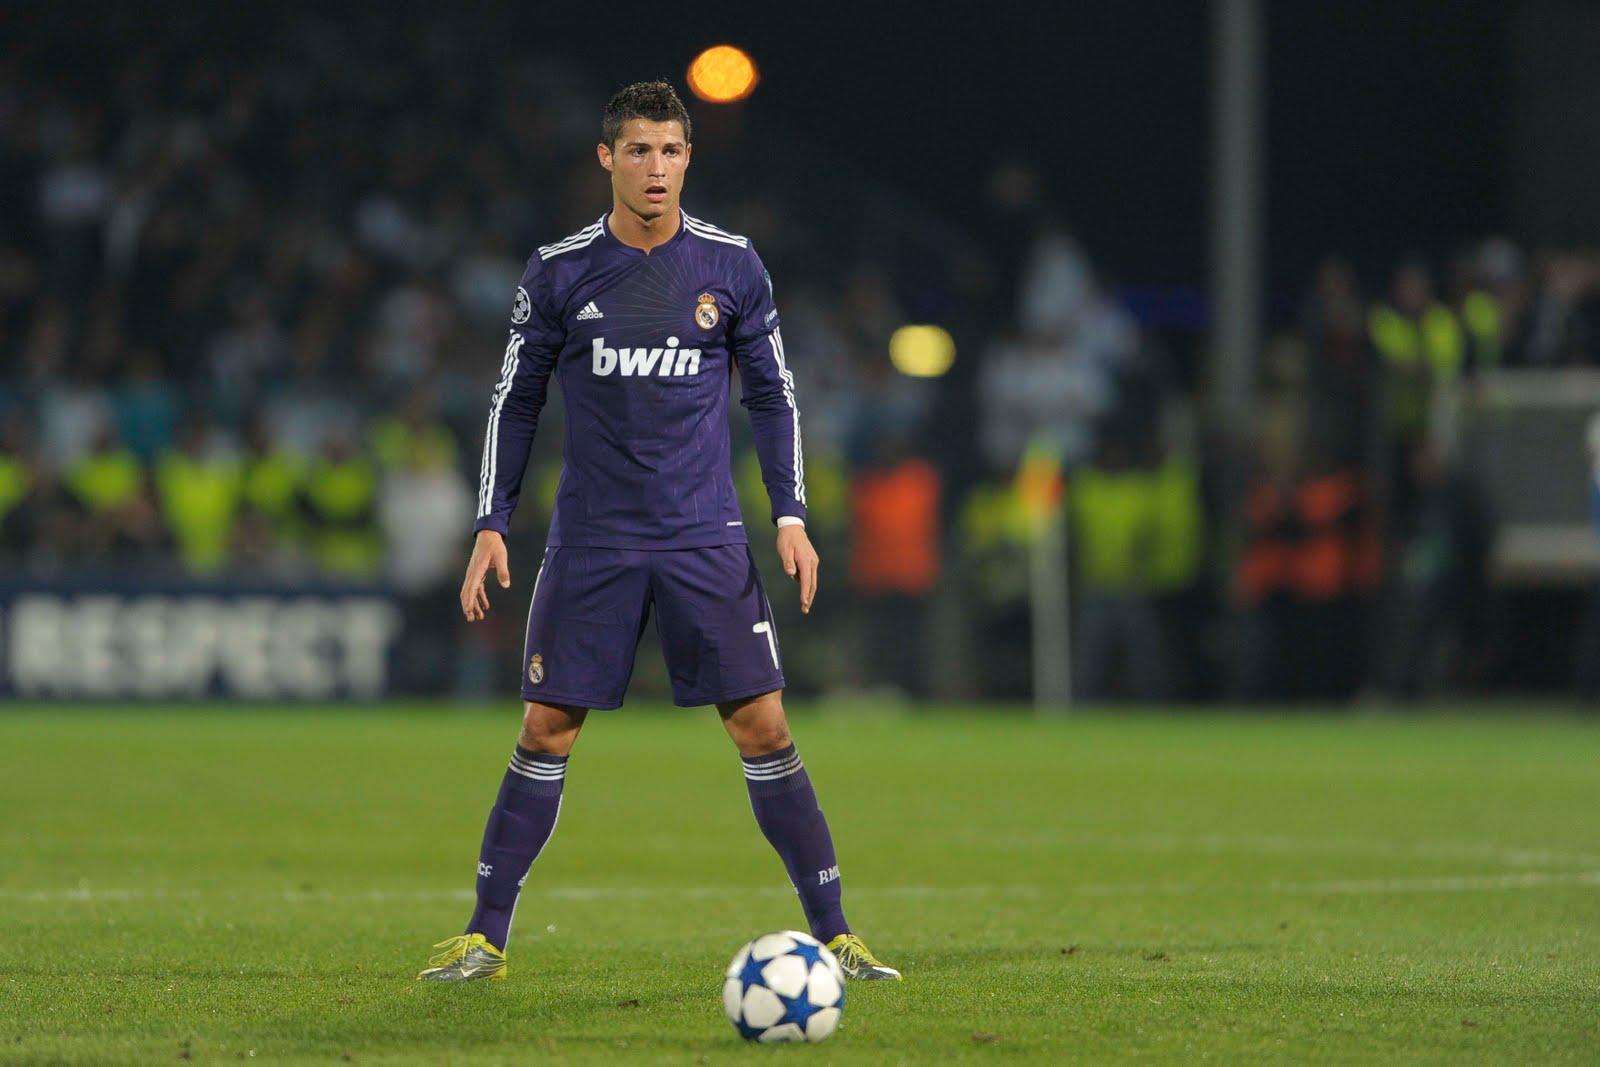 Cristiano Ronaldo Free Kick Pose Hd 4